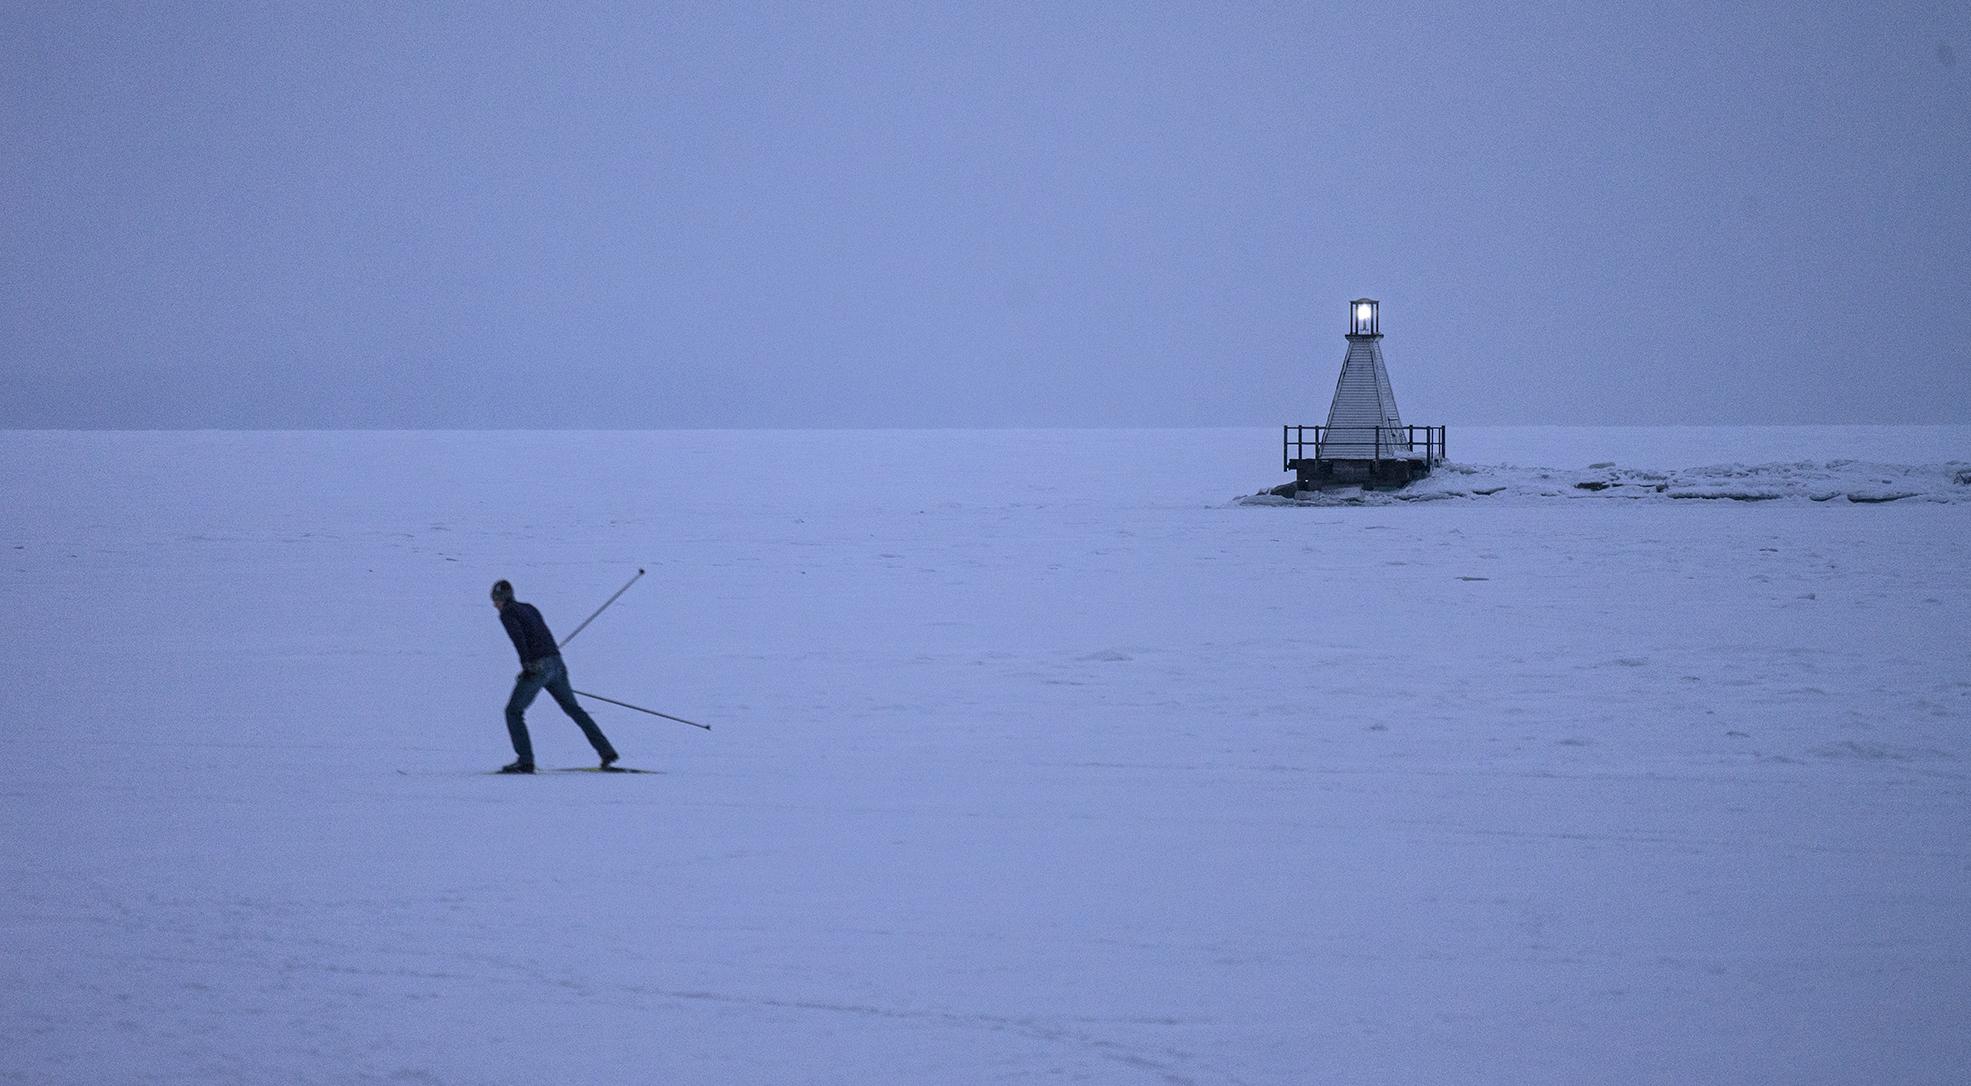 skier-w.jpg